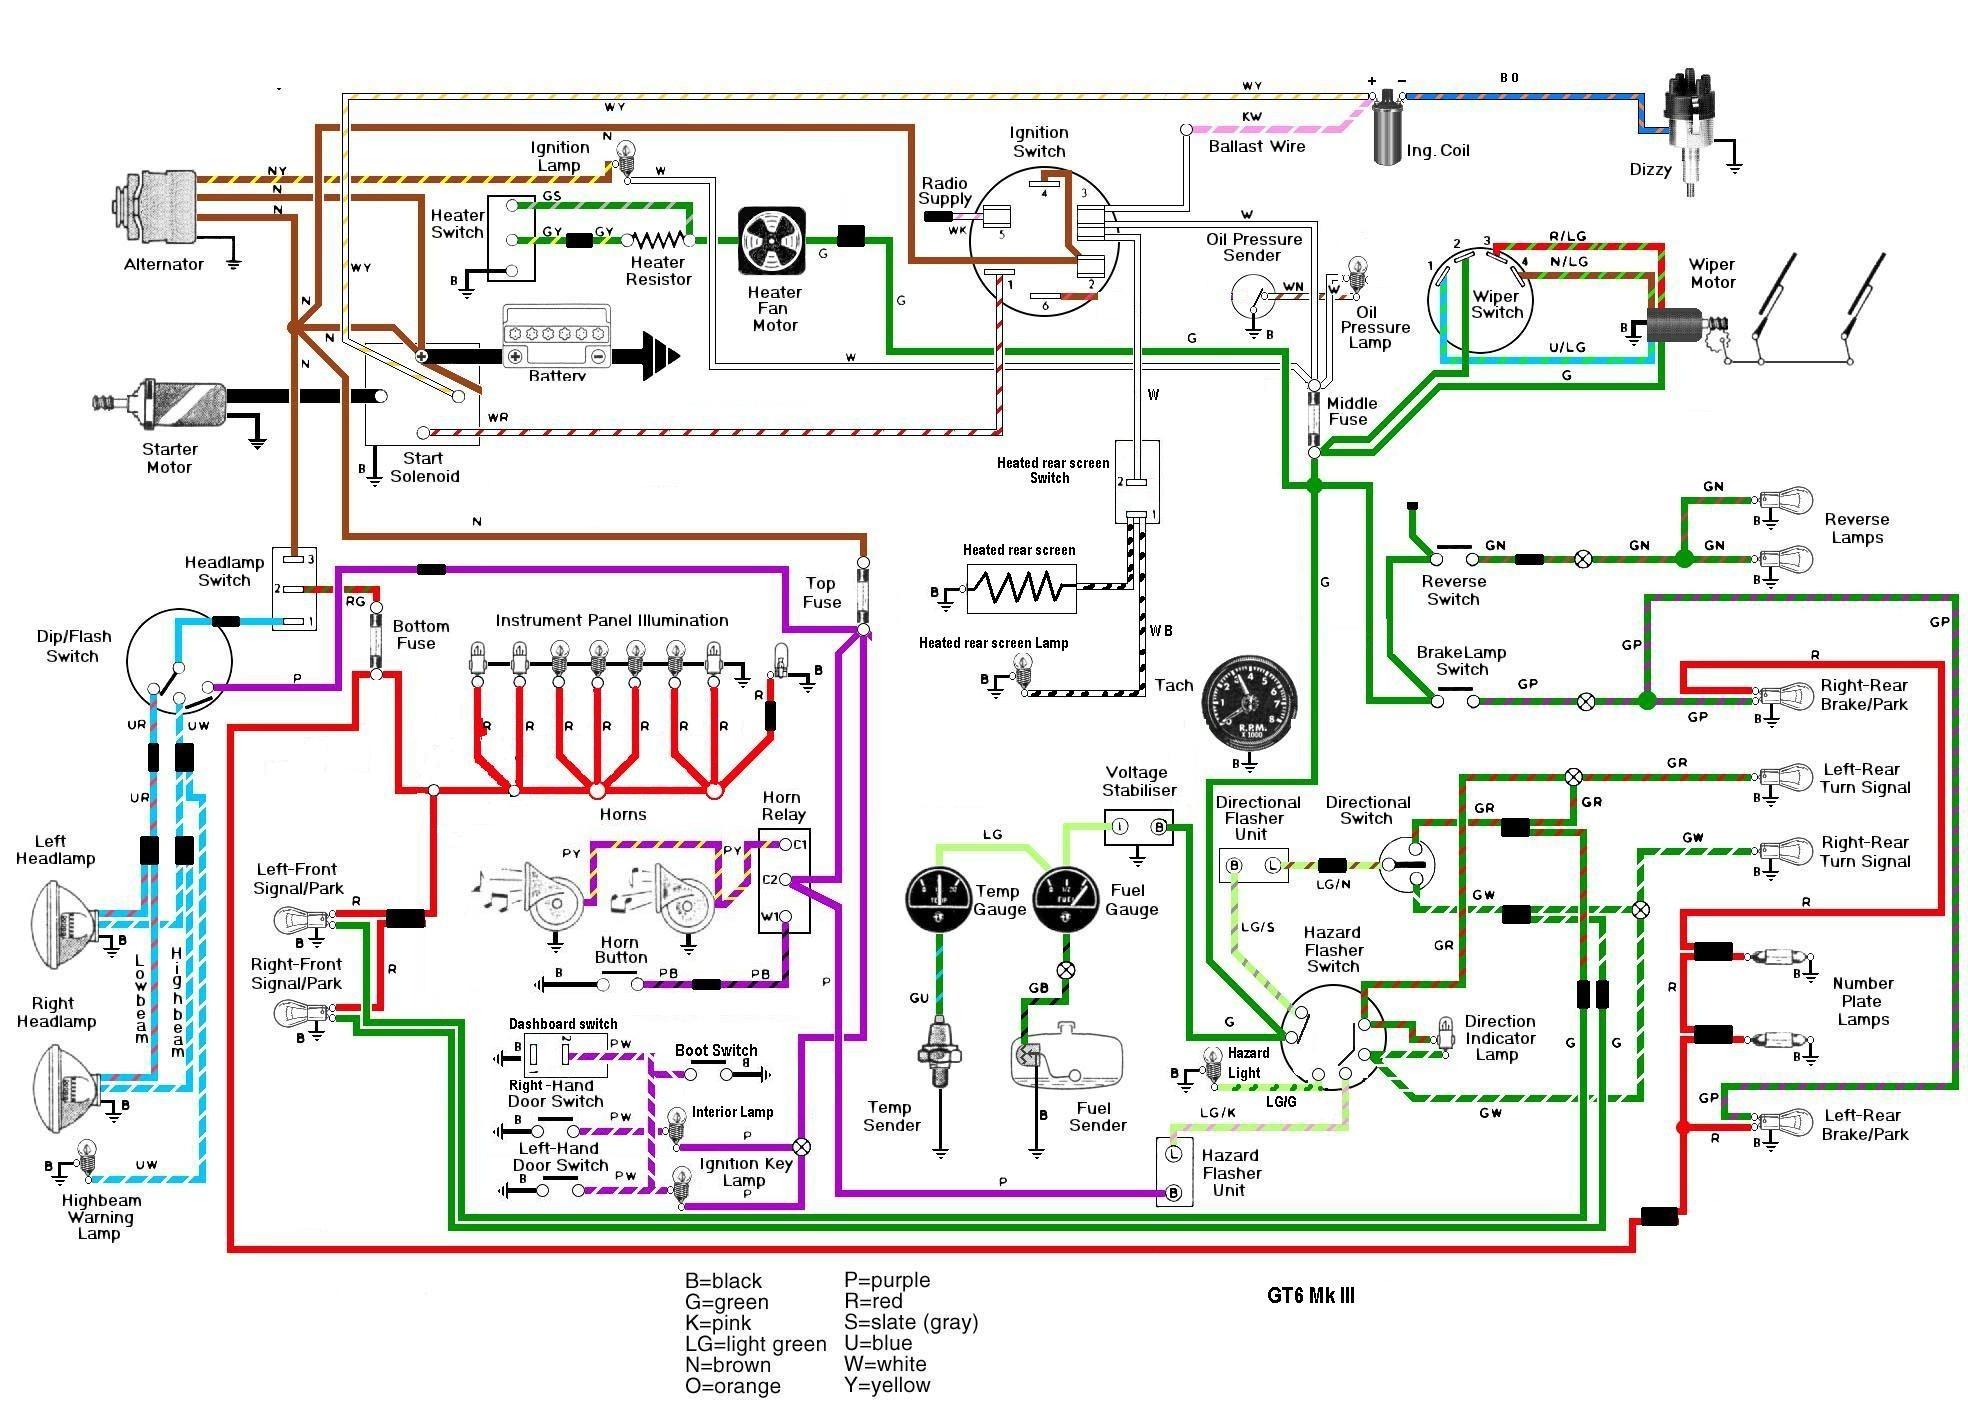 1976 Mgb Wiring Diagram   Wiring Diagram Ke Lamp Wiring Diagram Factory Five on